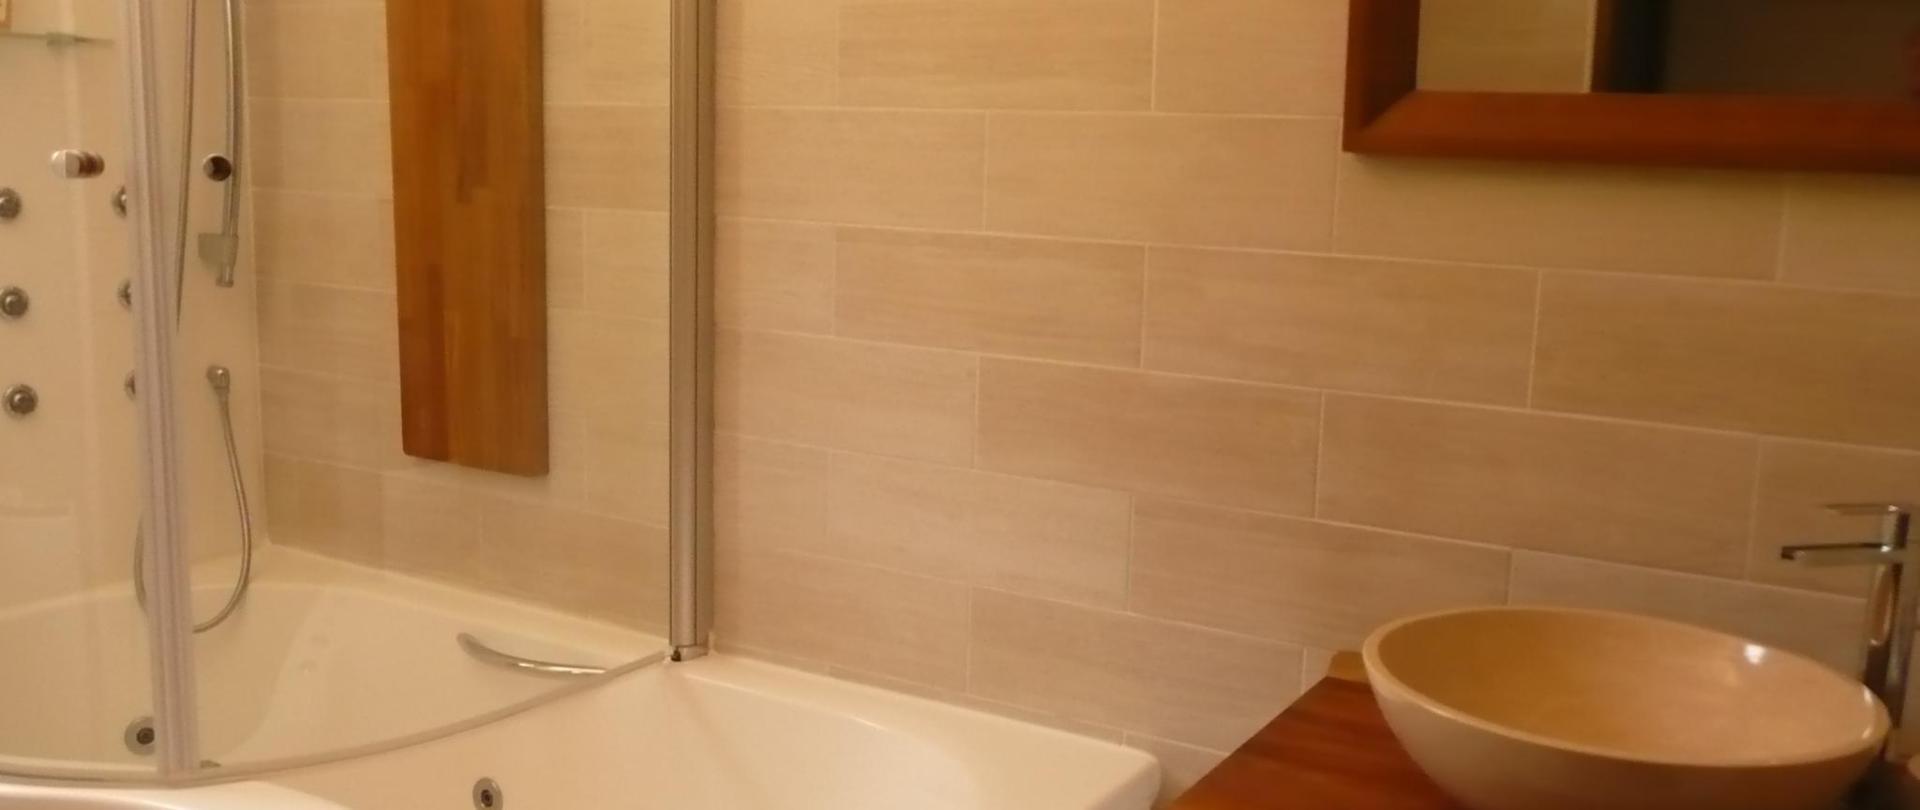 Salle de bain  baignoire douche balneo chambres Europe et Ste Vitoire1 (2017_07_19 14_54_03 UTC).JPG